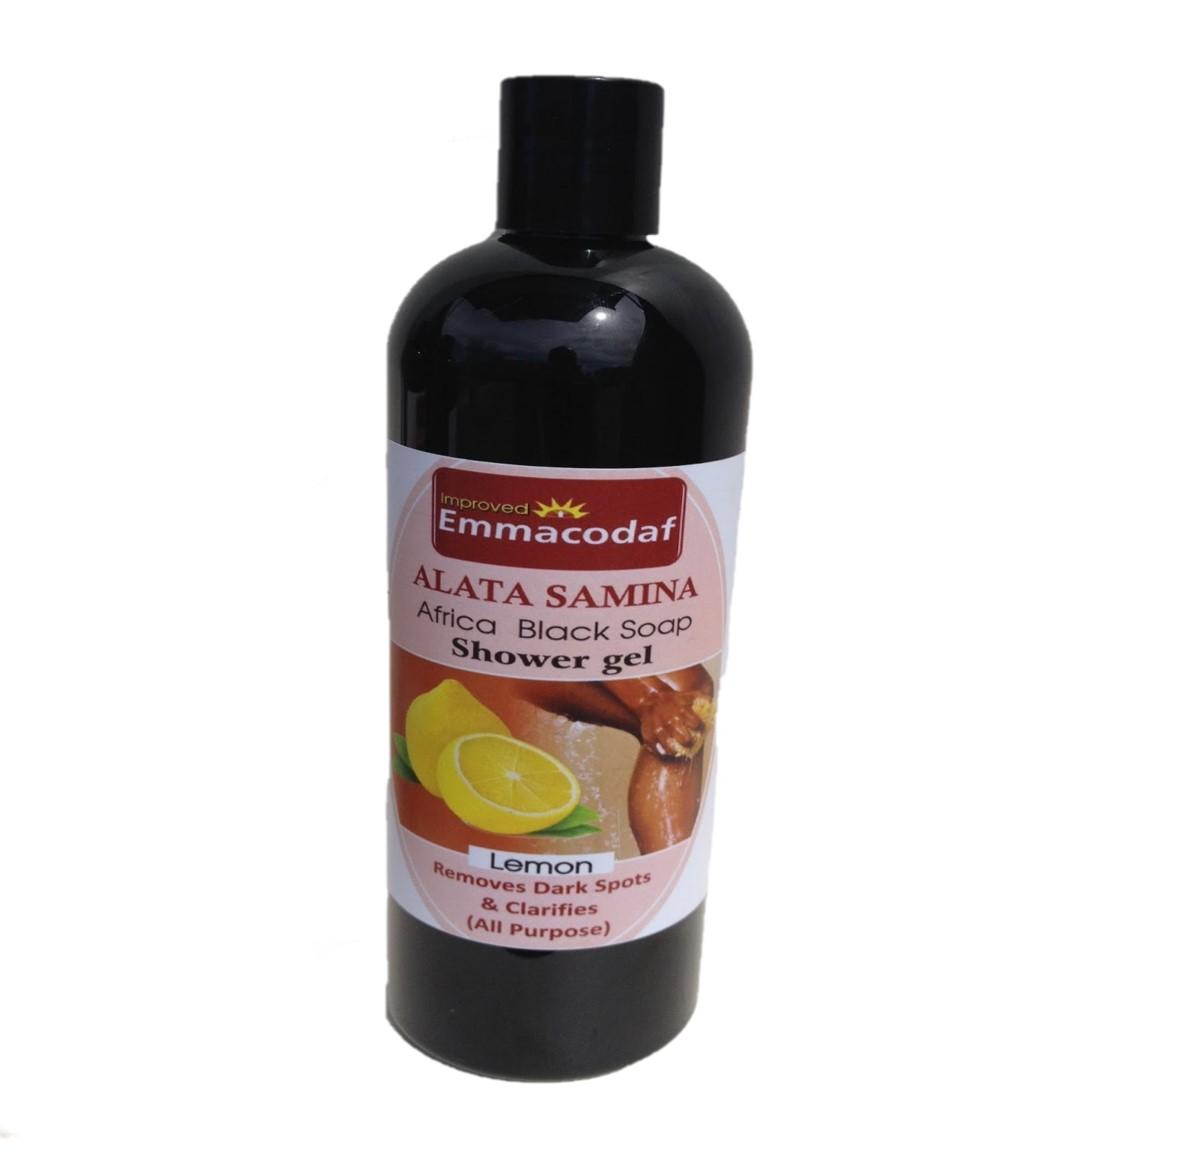 Alata Samina Shower Gel with Lemon